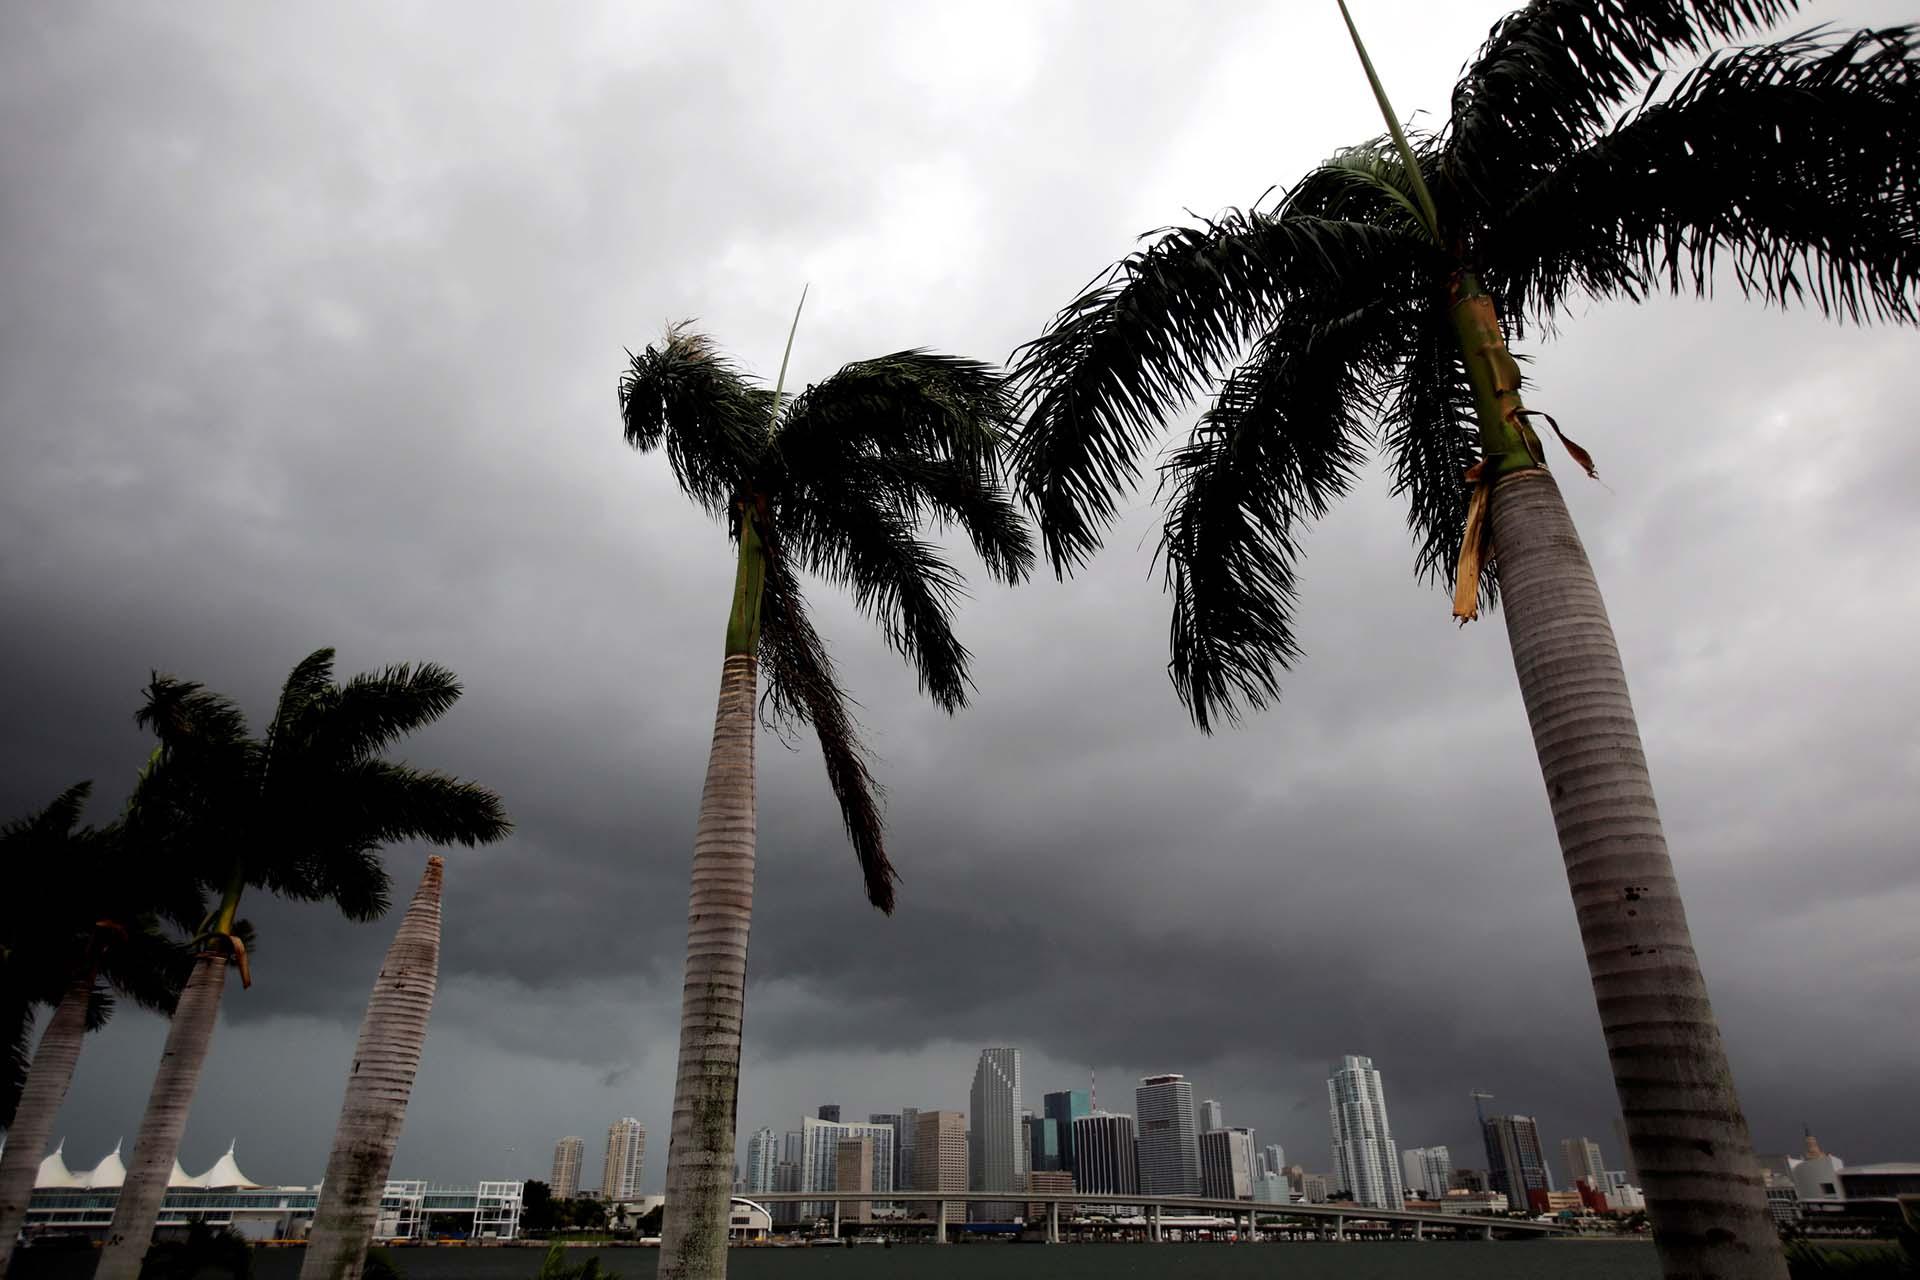 Florida, U.S